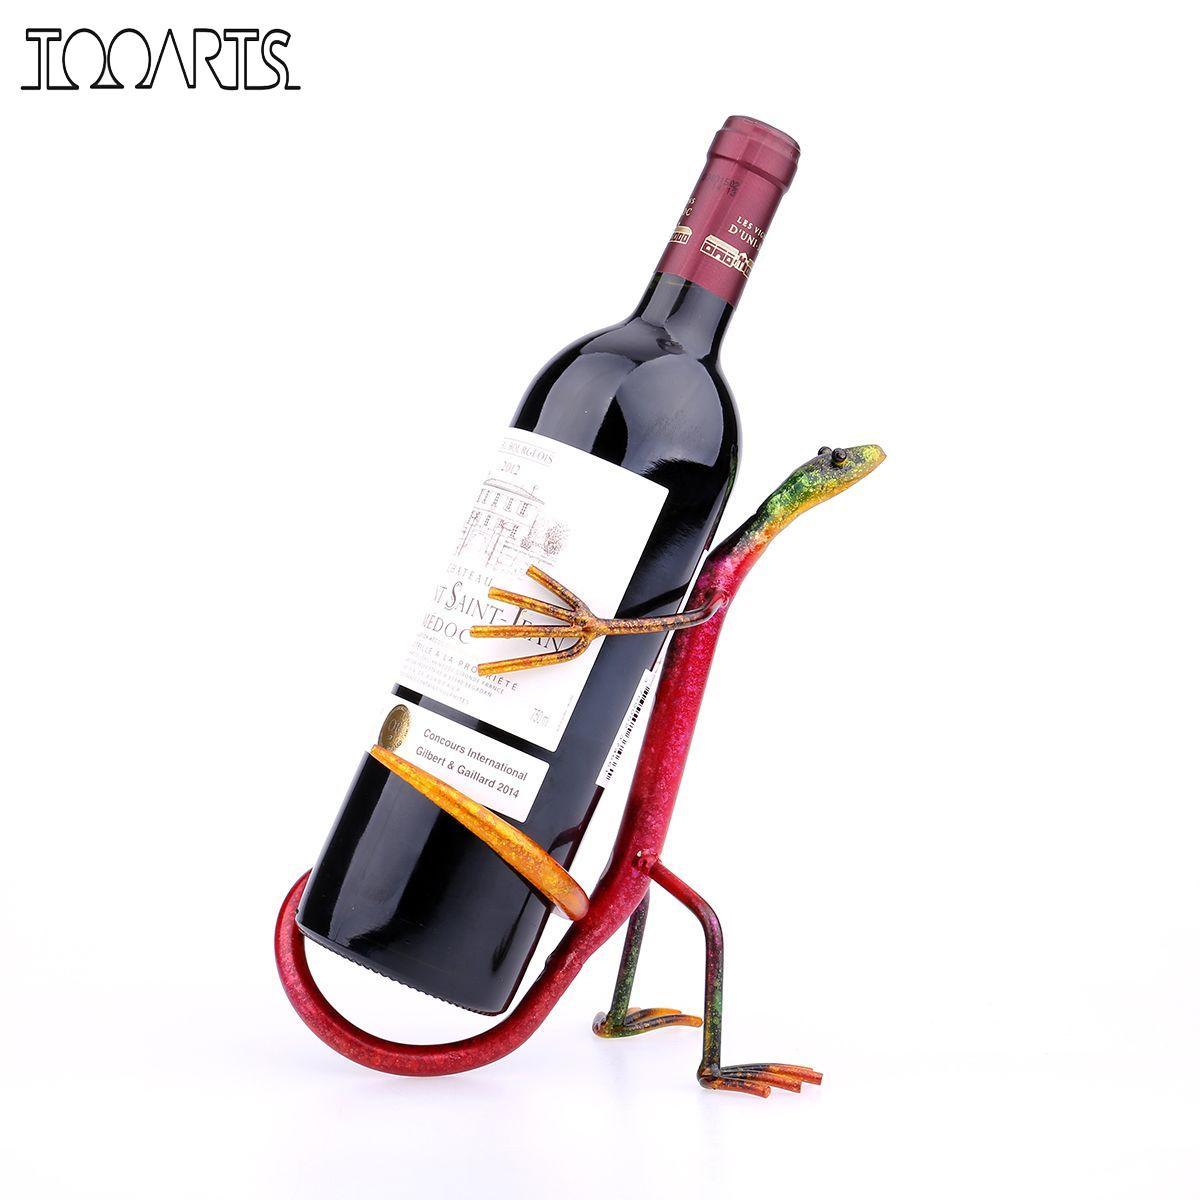 Fantasticmale Vente Tooarts Gecko Casier A Vin Moderne